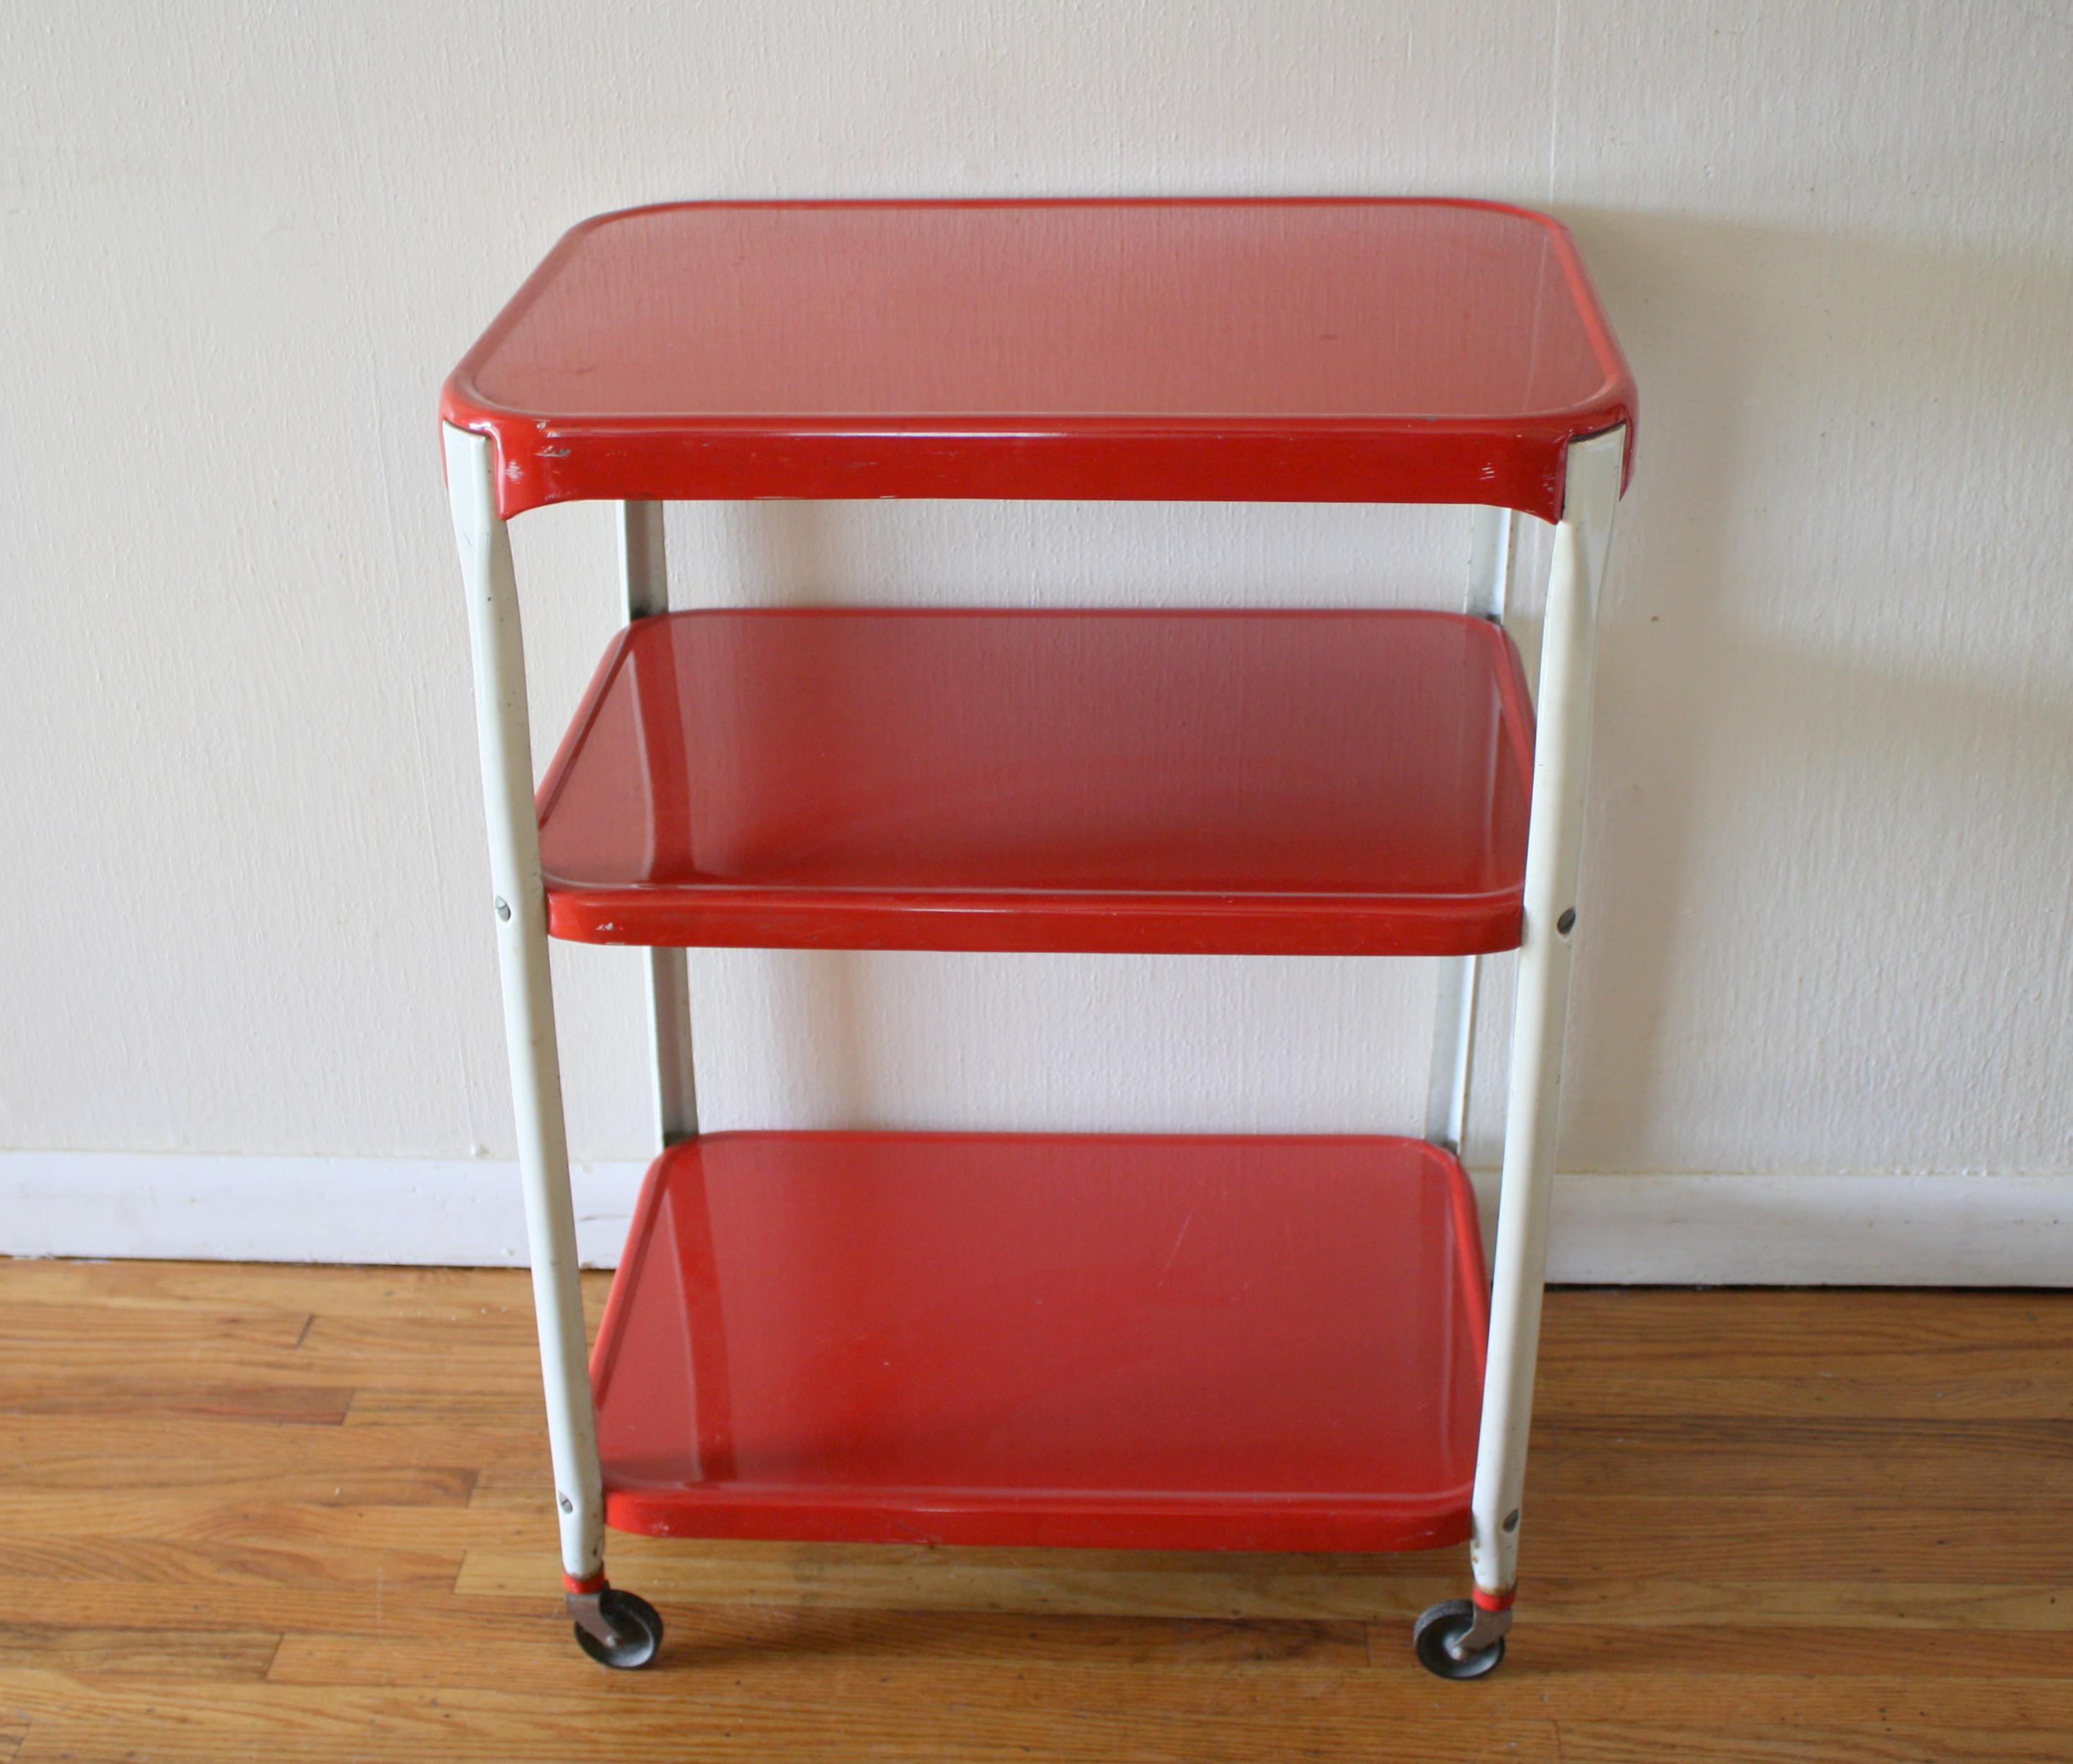 Vintage Metal Kitchen Cart Retro 3 Tier Shelf Metal Carts Picked Vintage